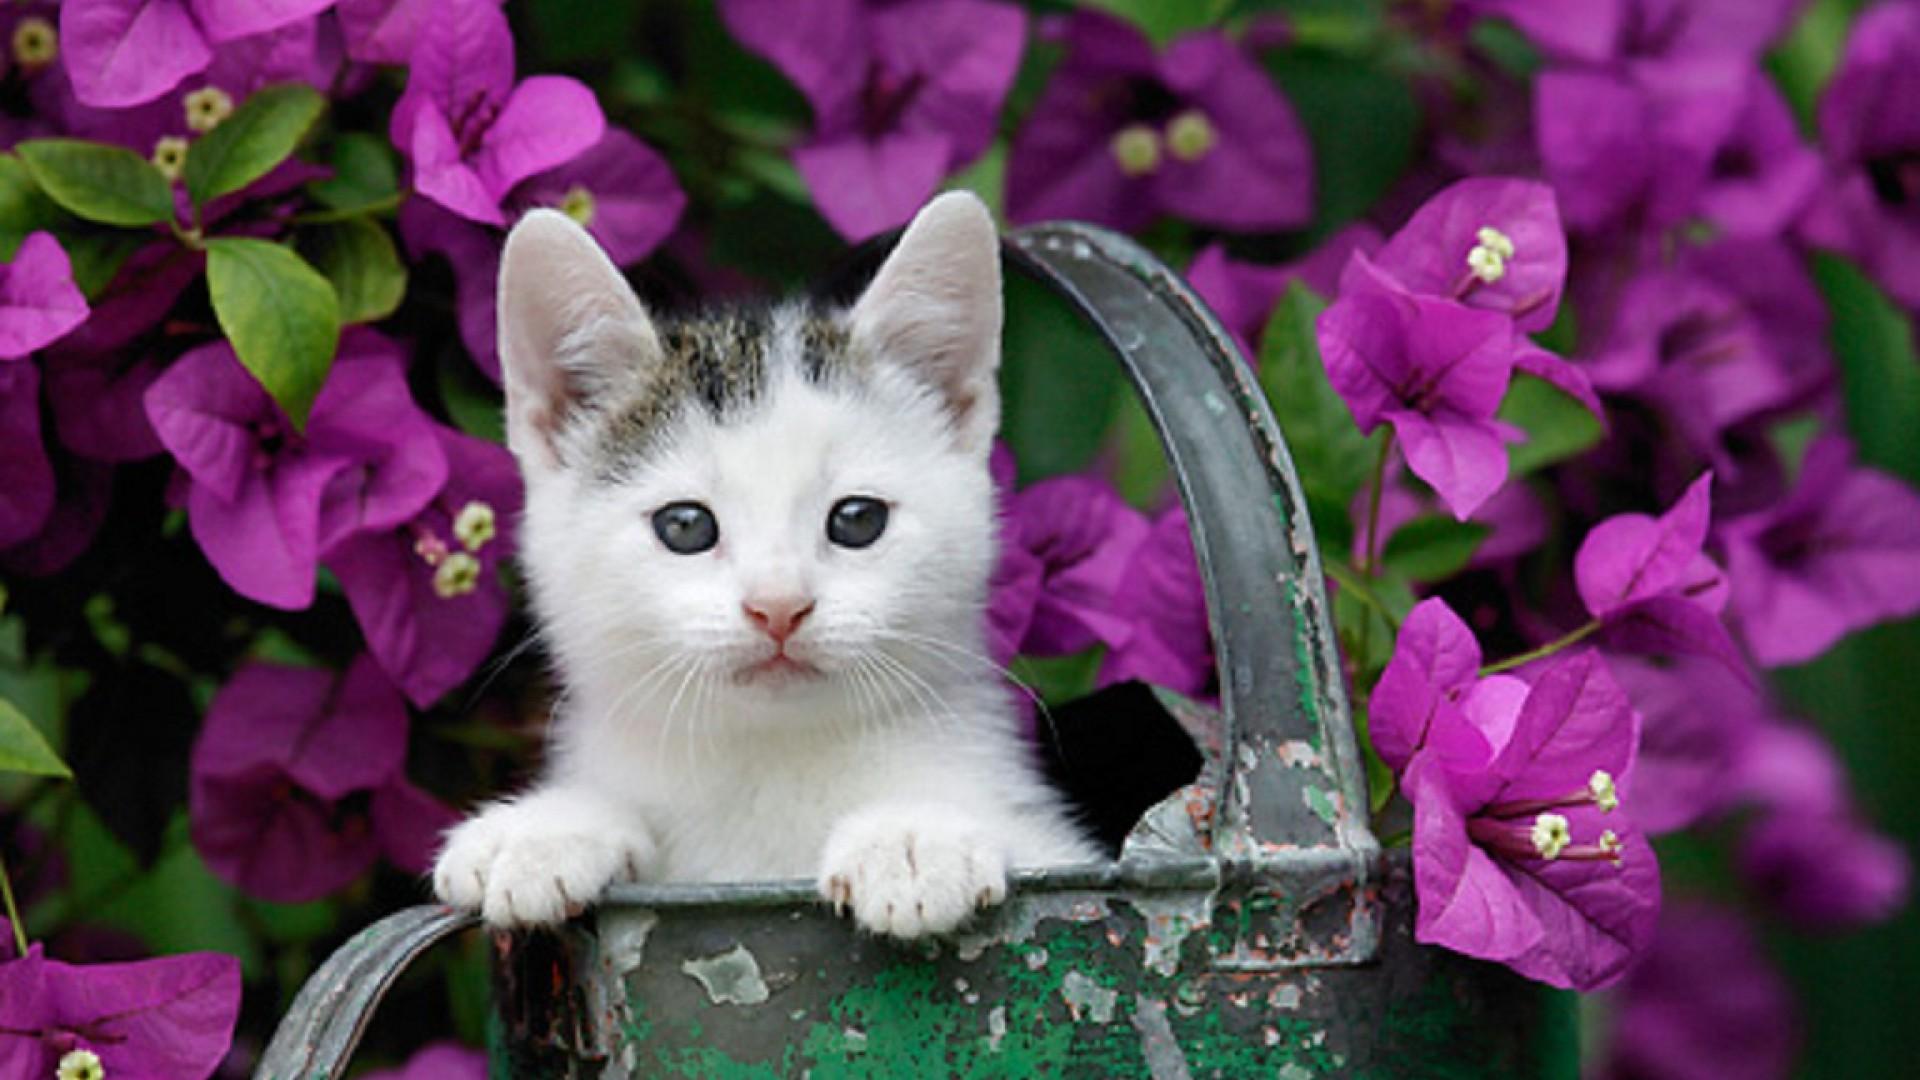 Gattini sfondi 73 immagini for Sfondi animali hd